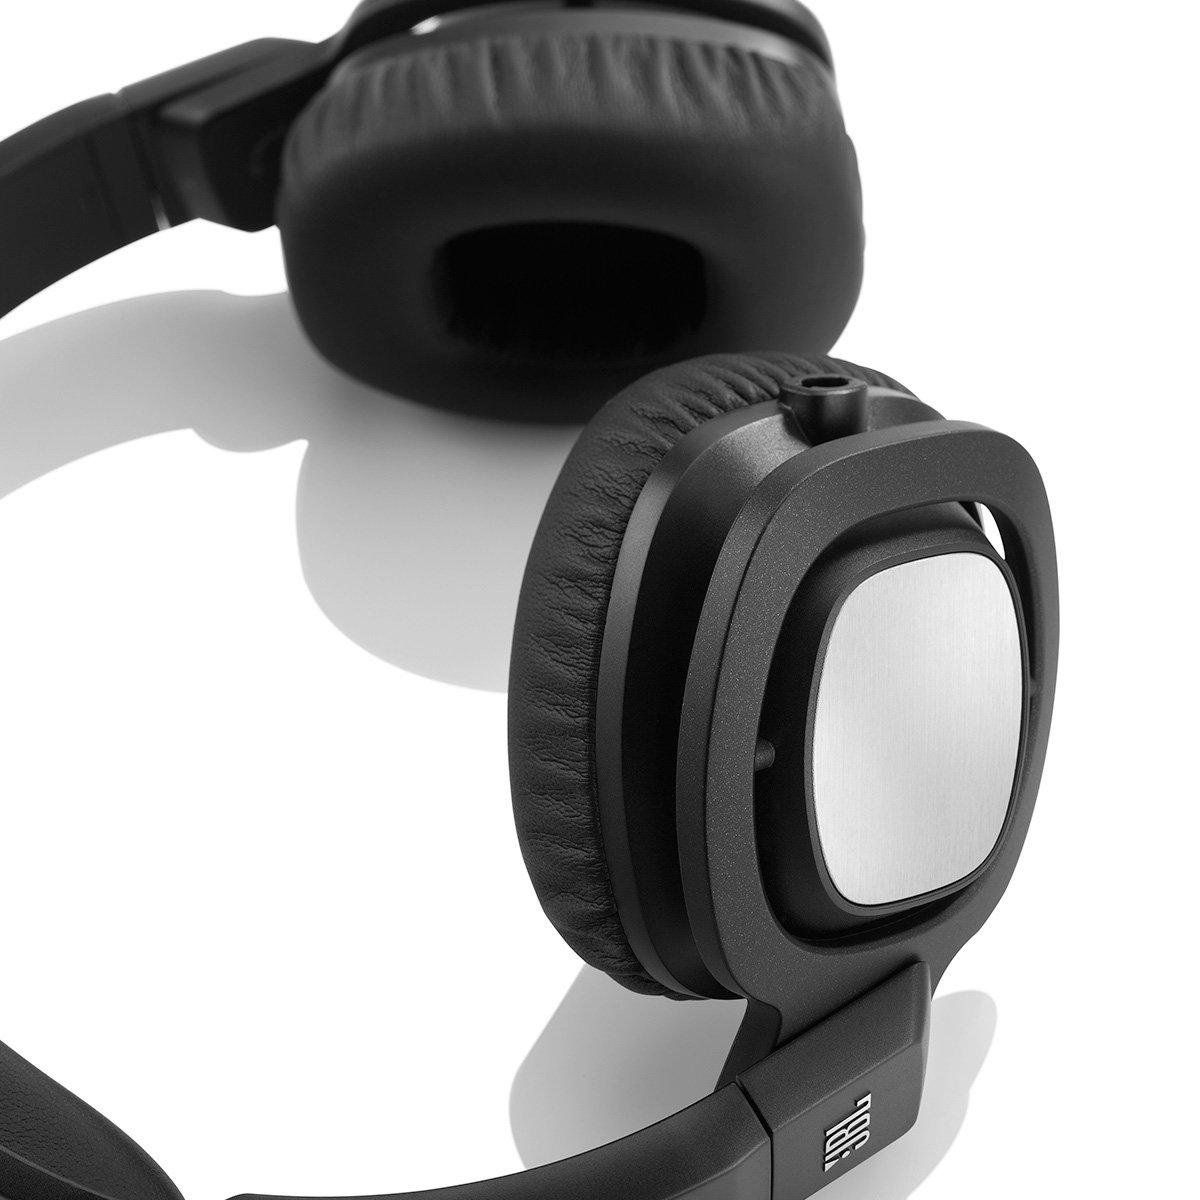 Fone de Ouvido com Microfone J55i Preto - JBL